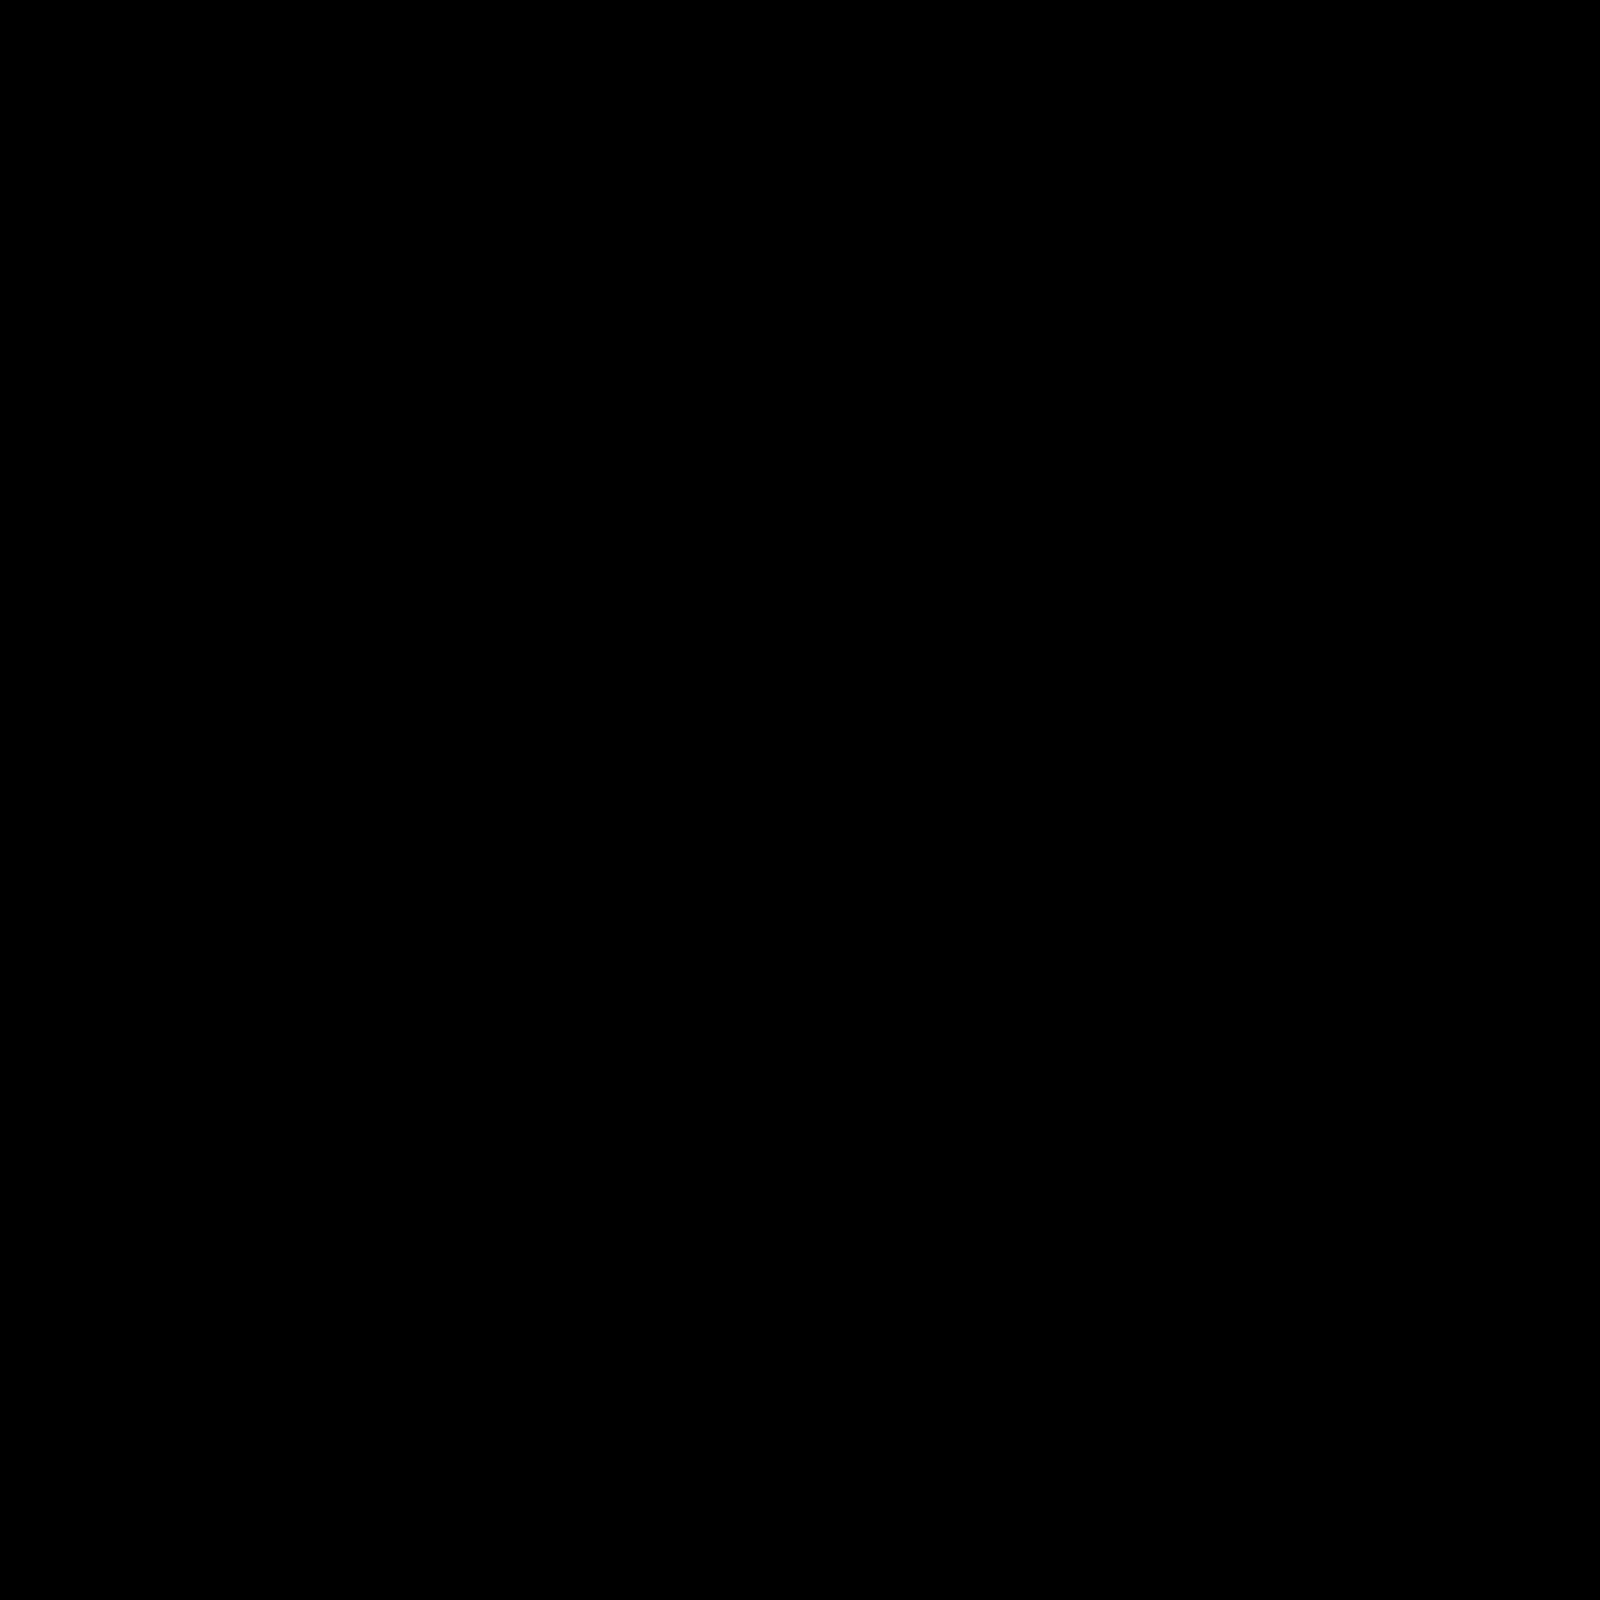 Snowmobile icon